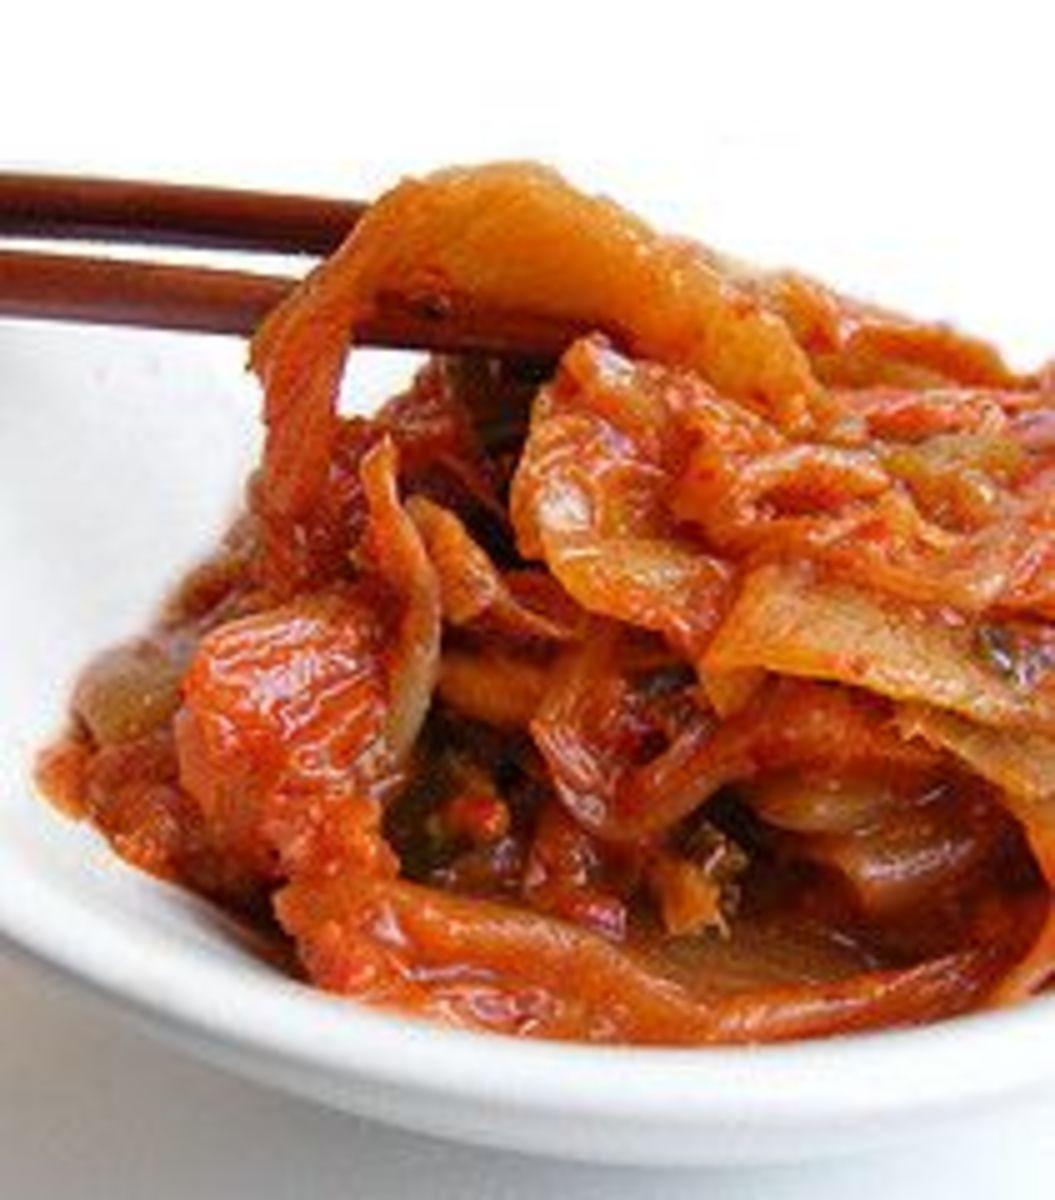 kimchee-ccflcr-fotoos-van-robin